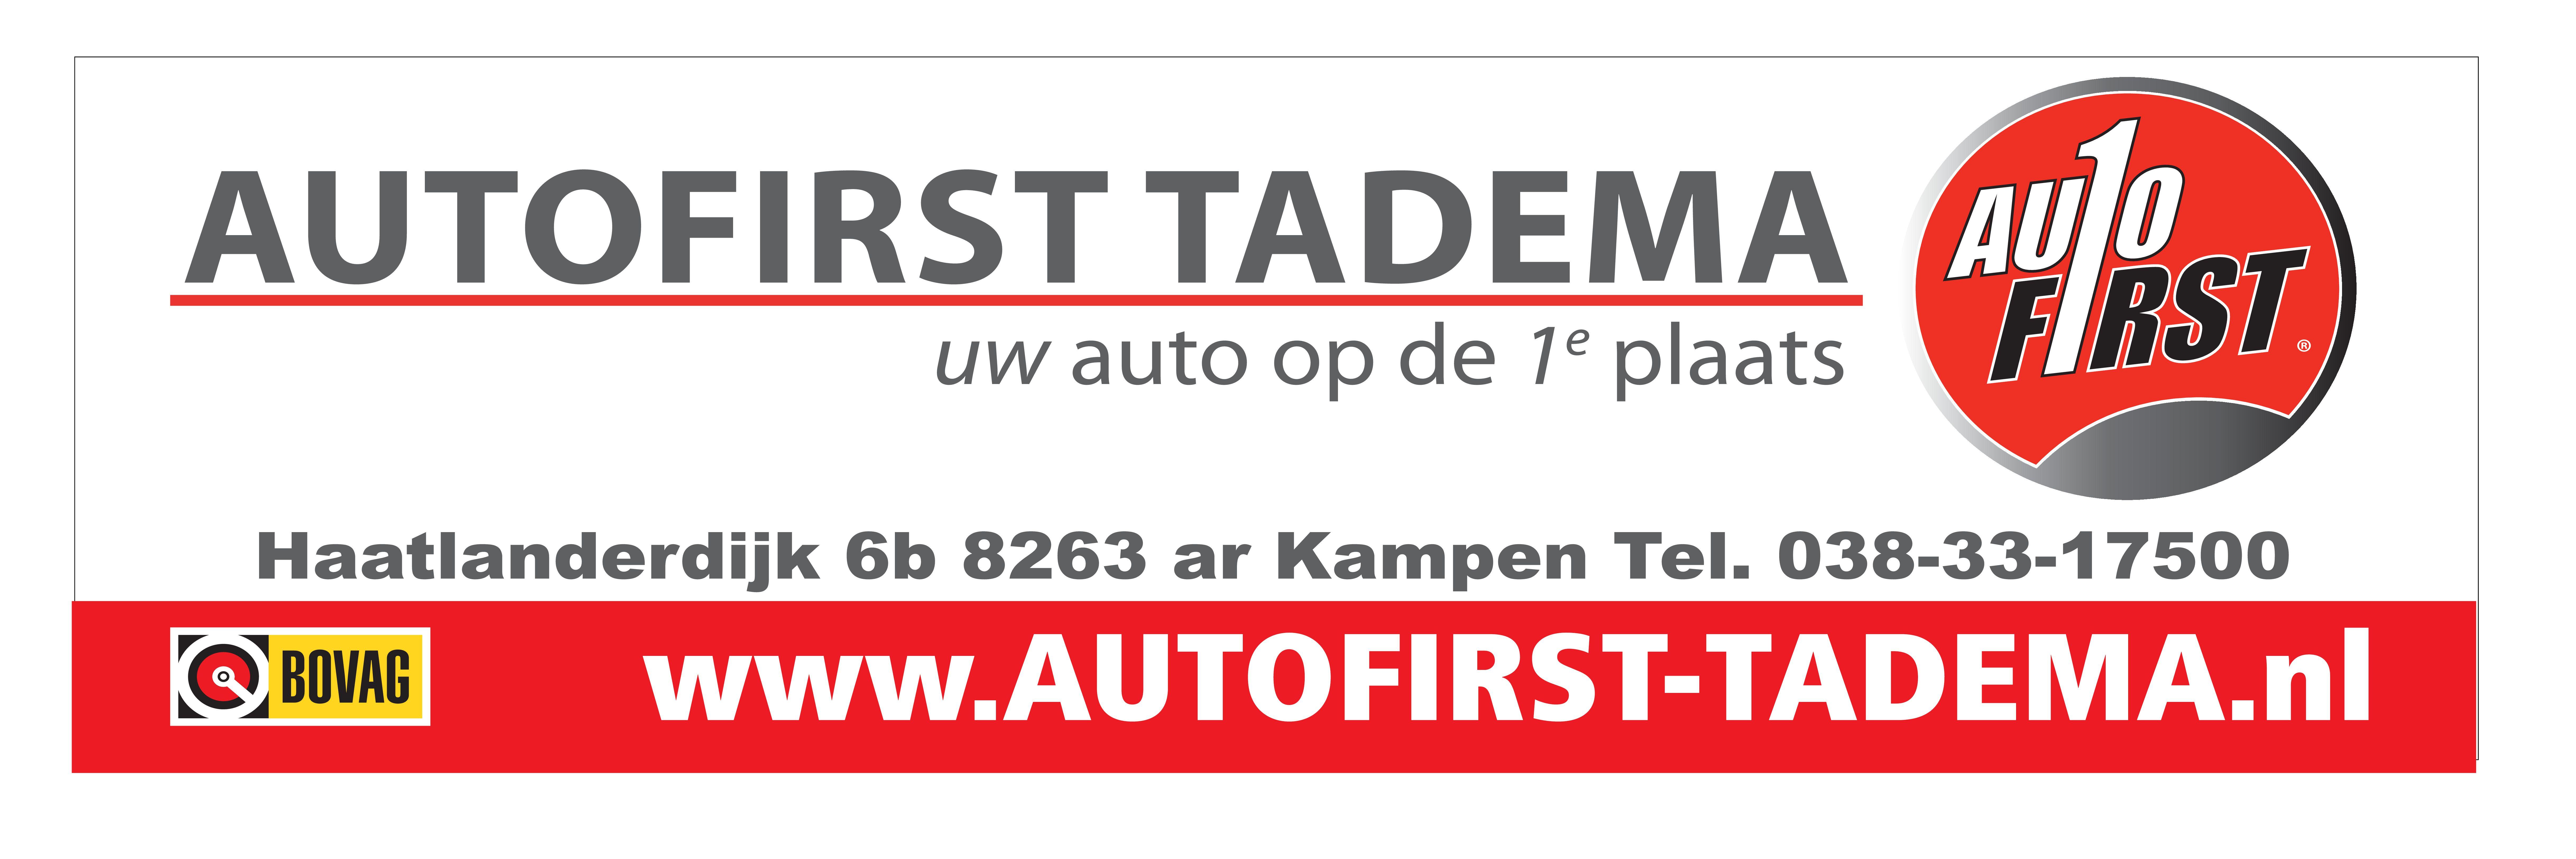 Autofirst Tadema